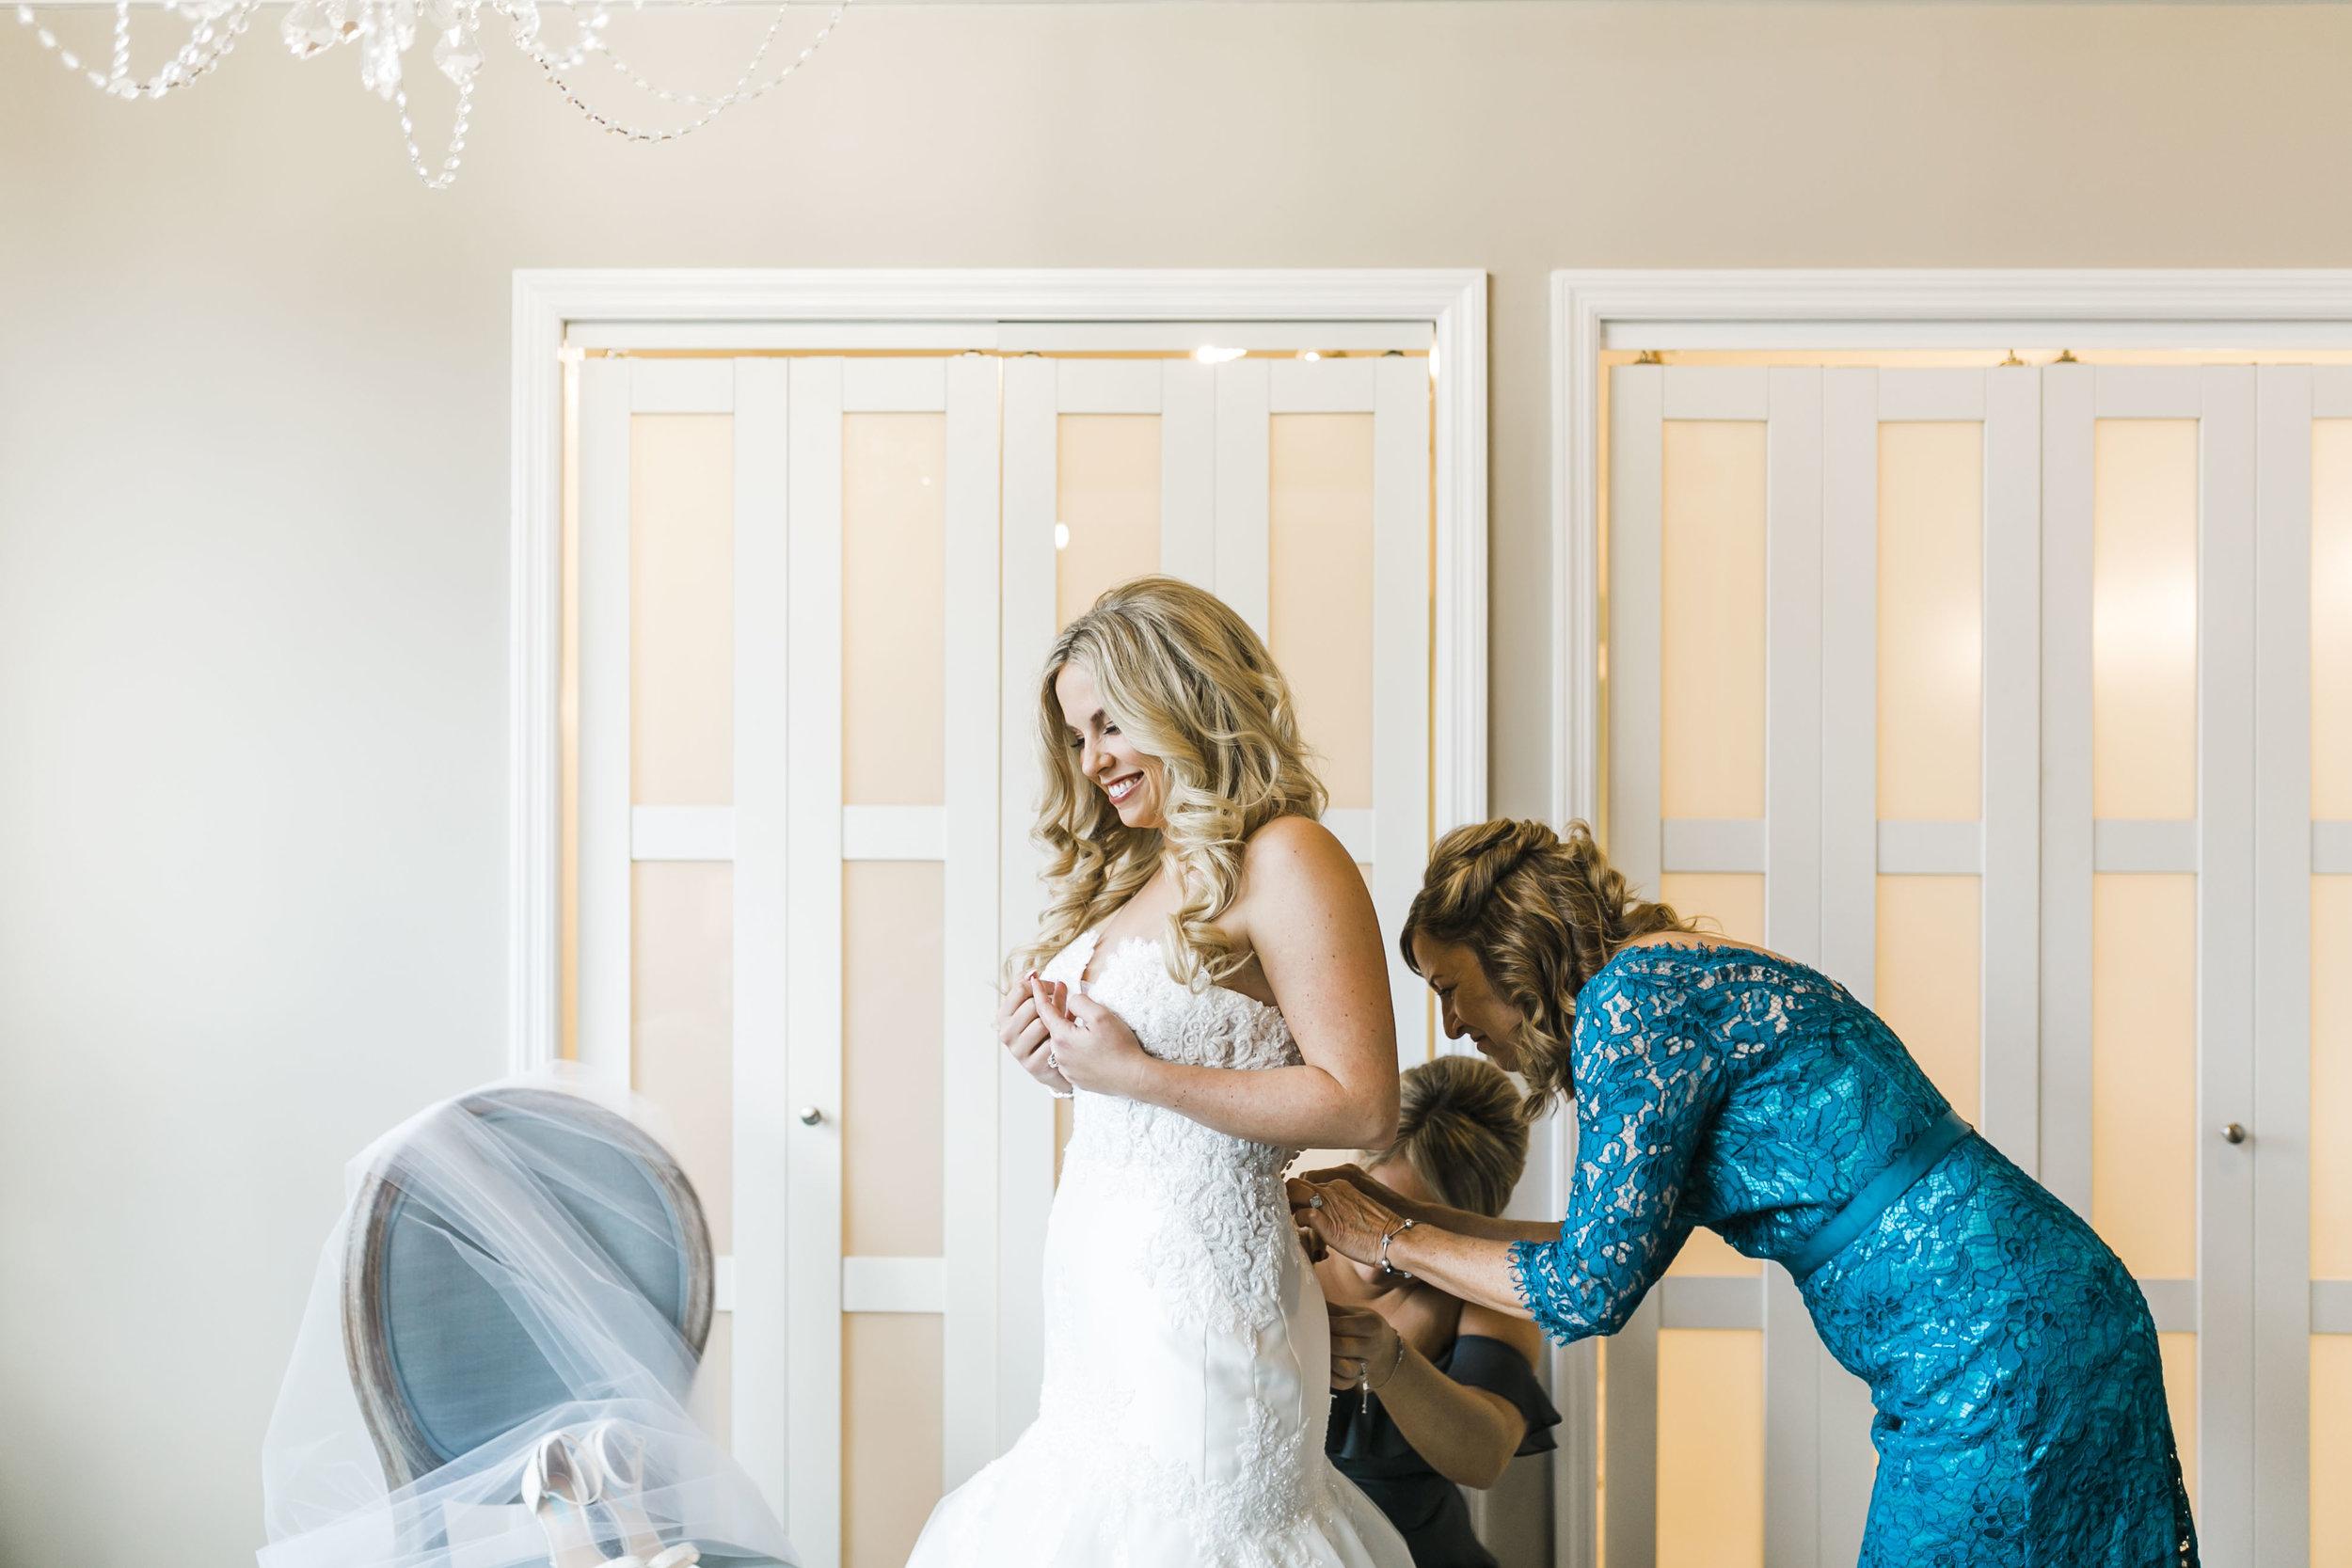 tellico village wedding photography